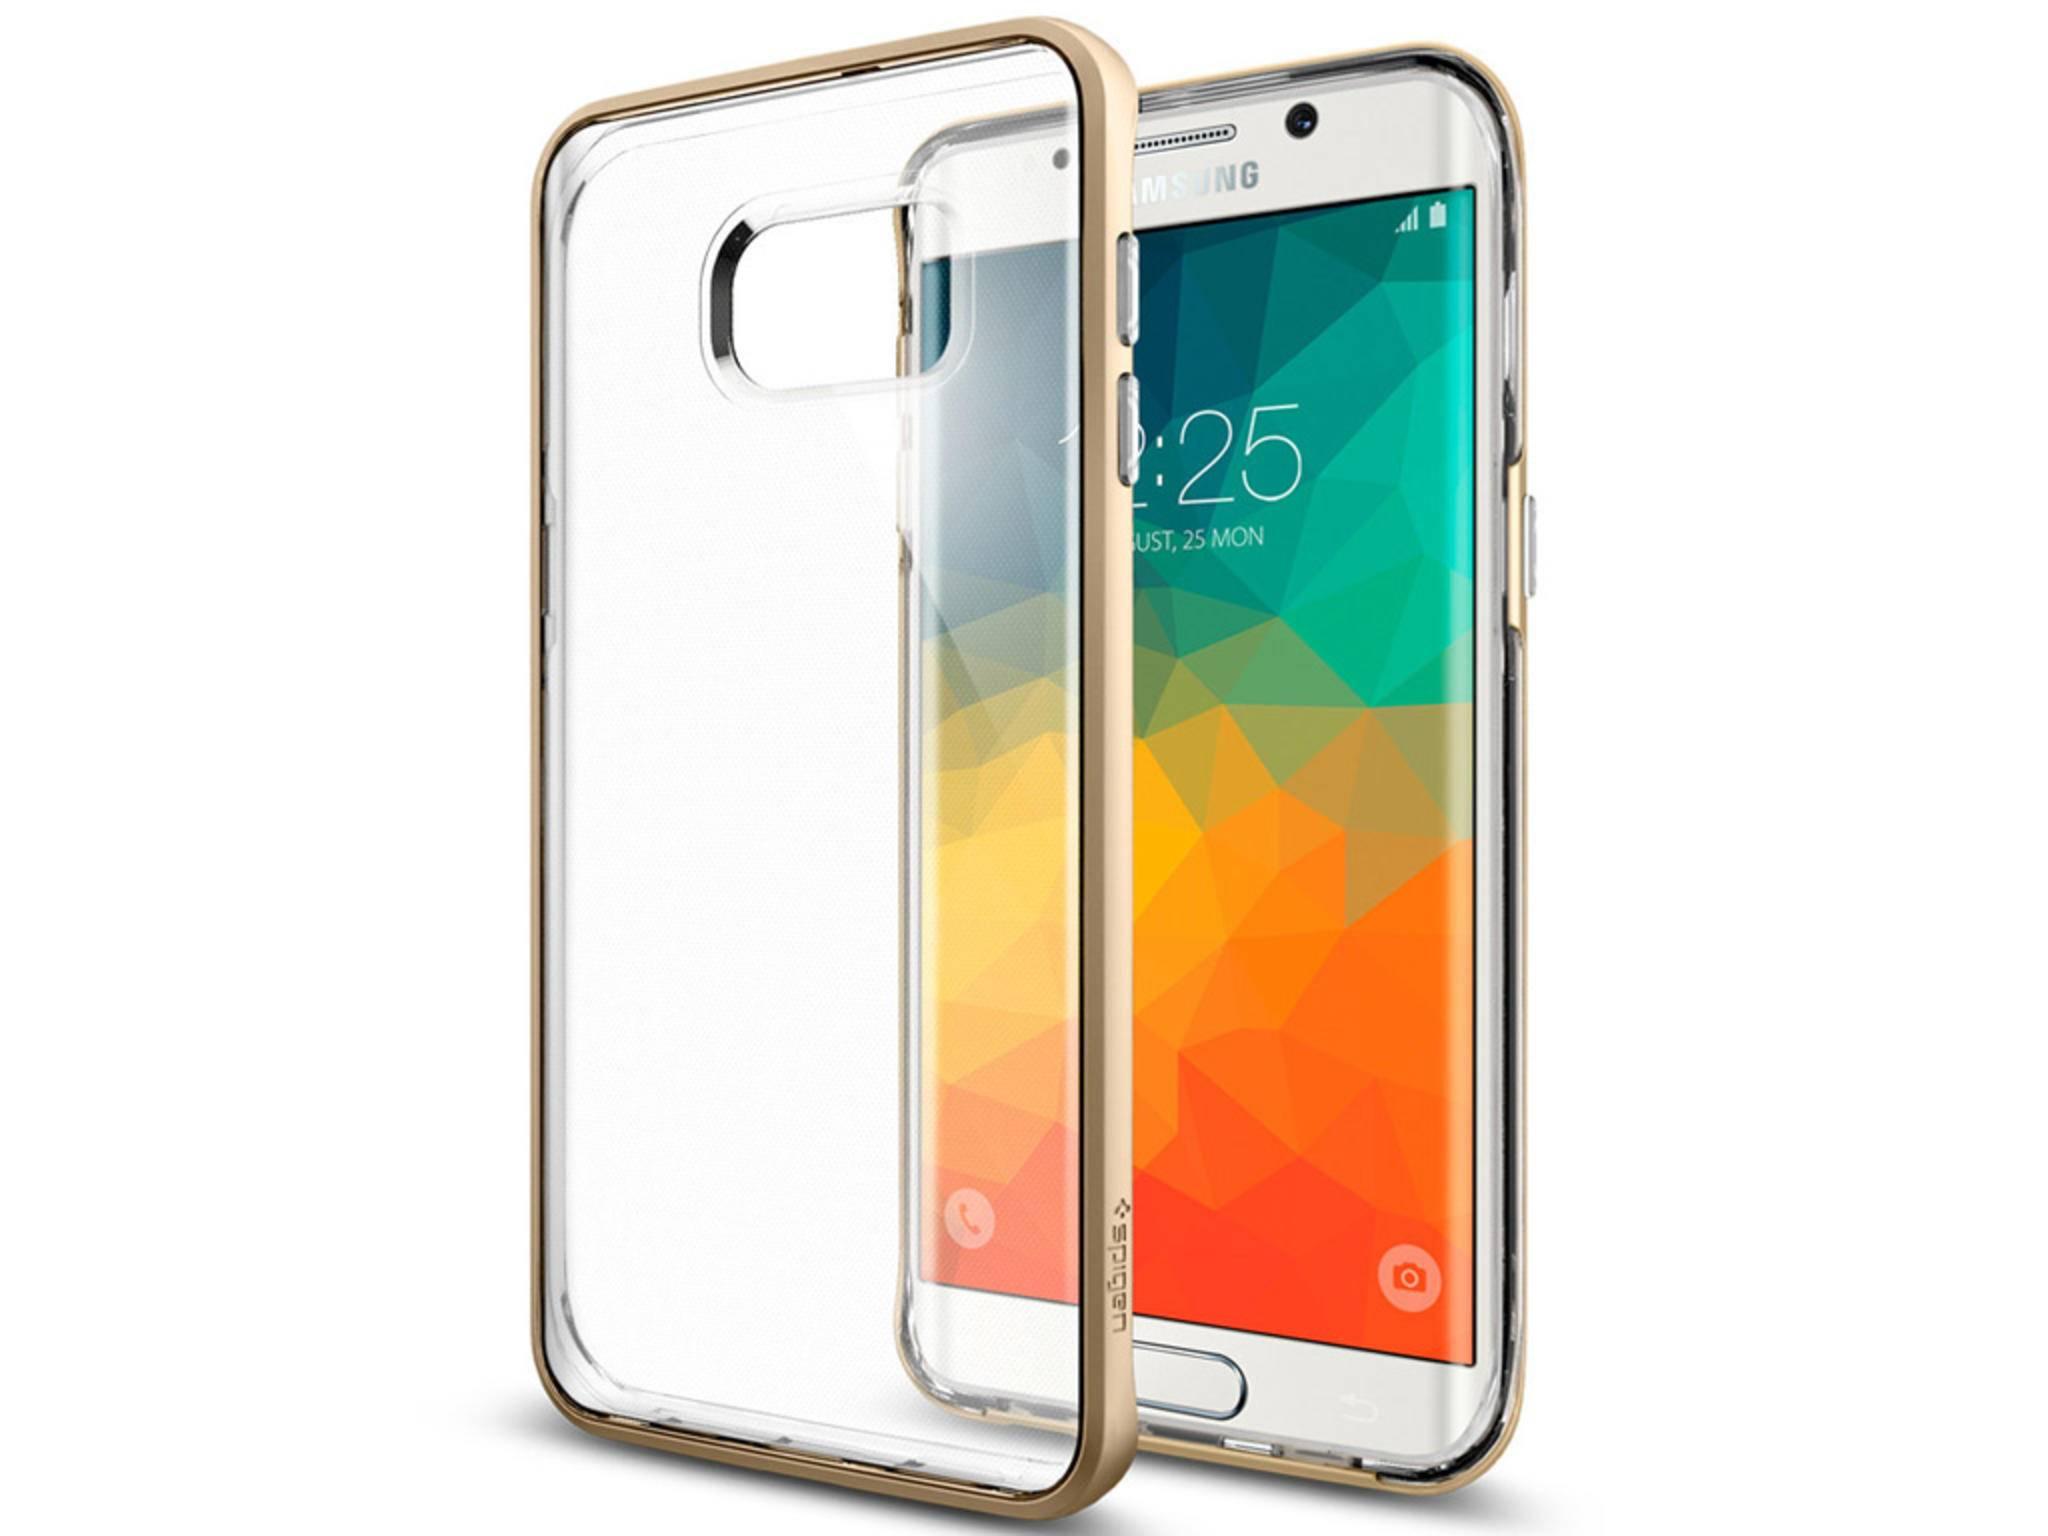 Galaxy S6 Edge+ Case